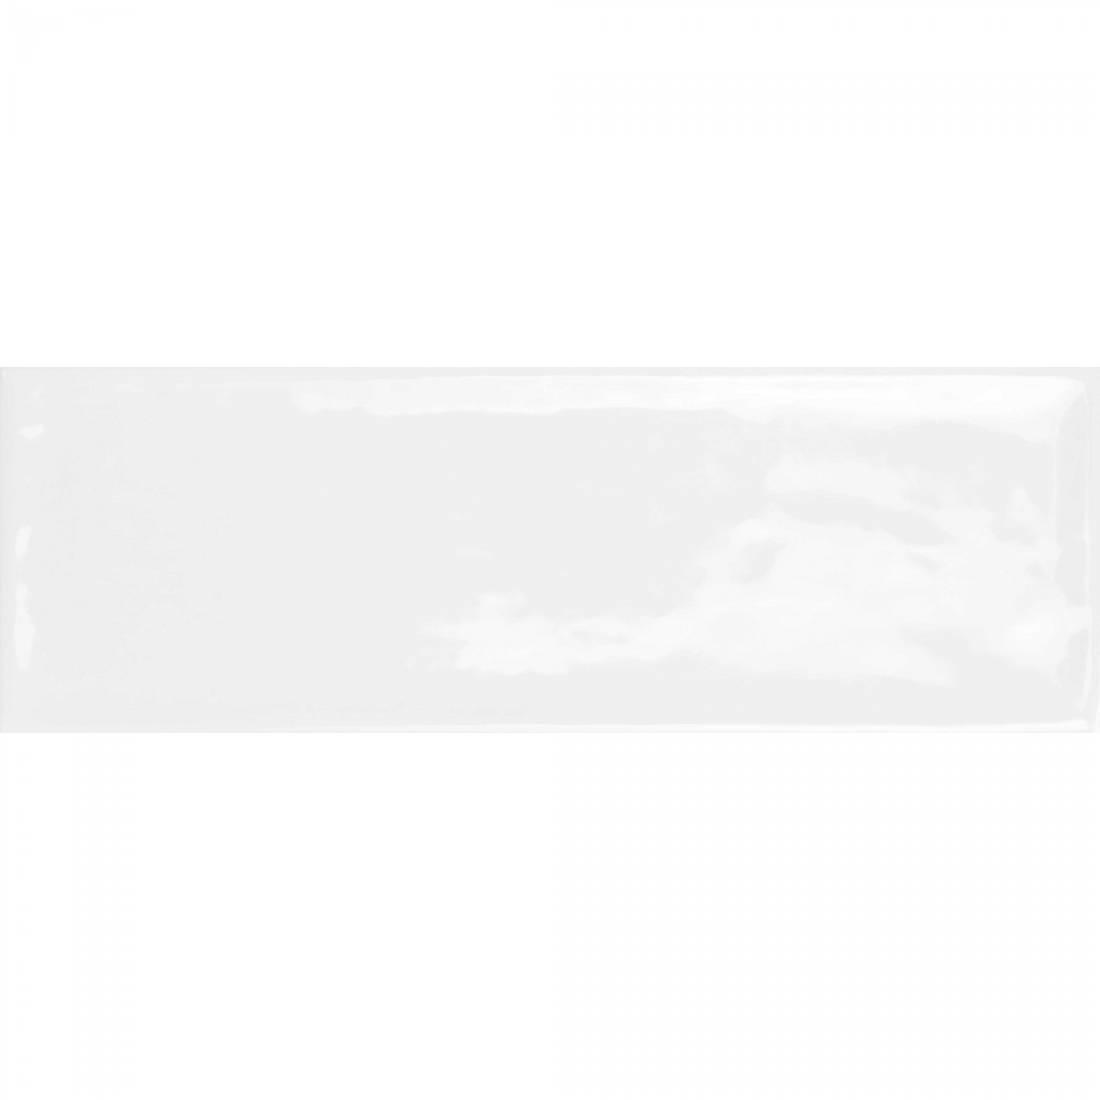 Esencia 10x30 Blanco Gloss 1